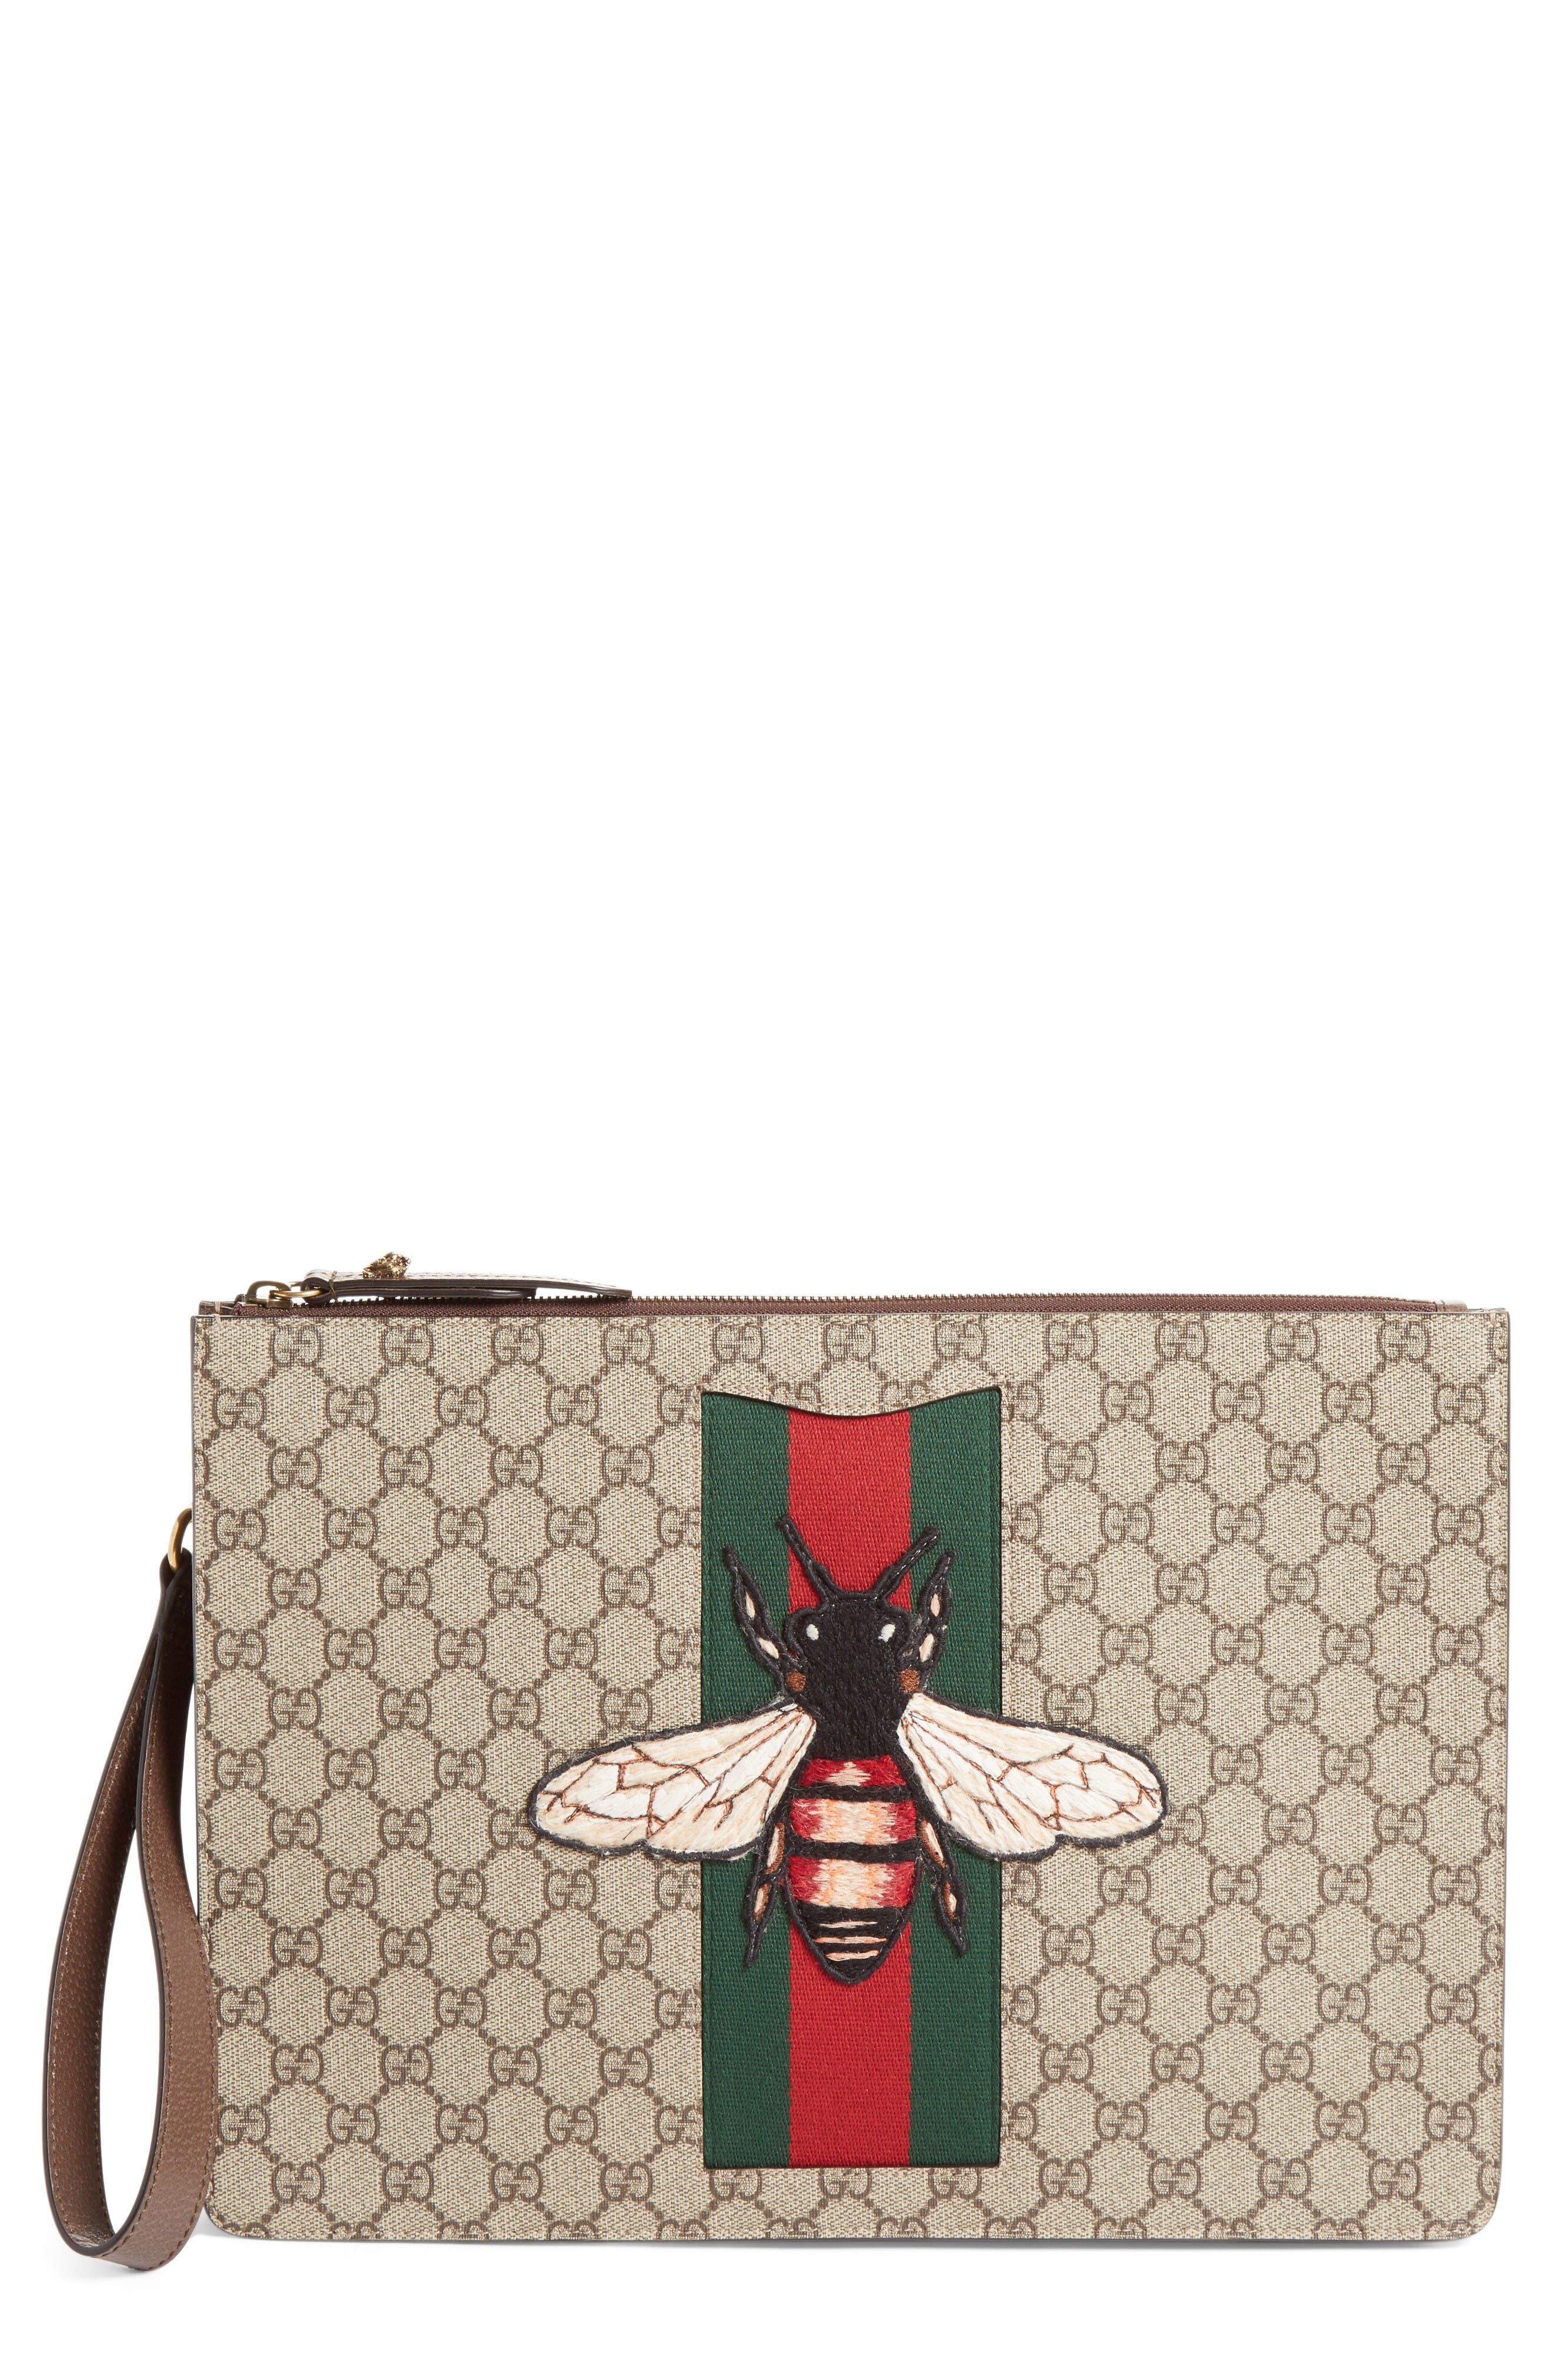 Gucci Bee Appliqué Supreme Canvas Zipper Pouch